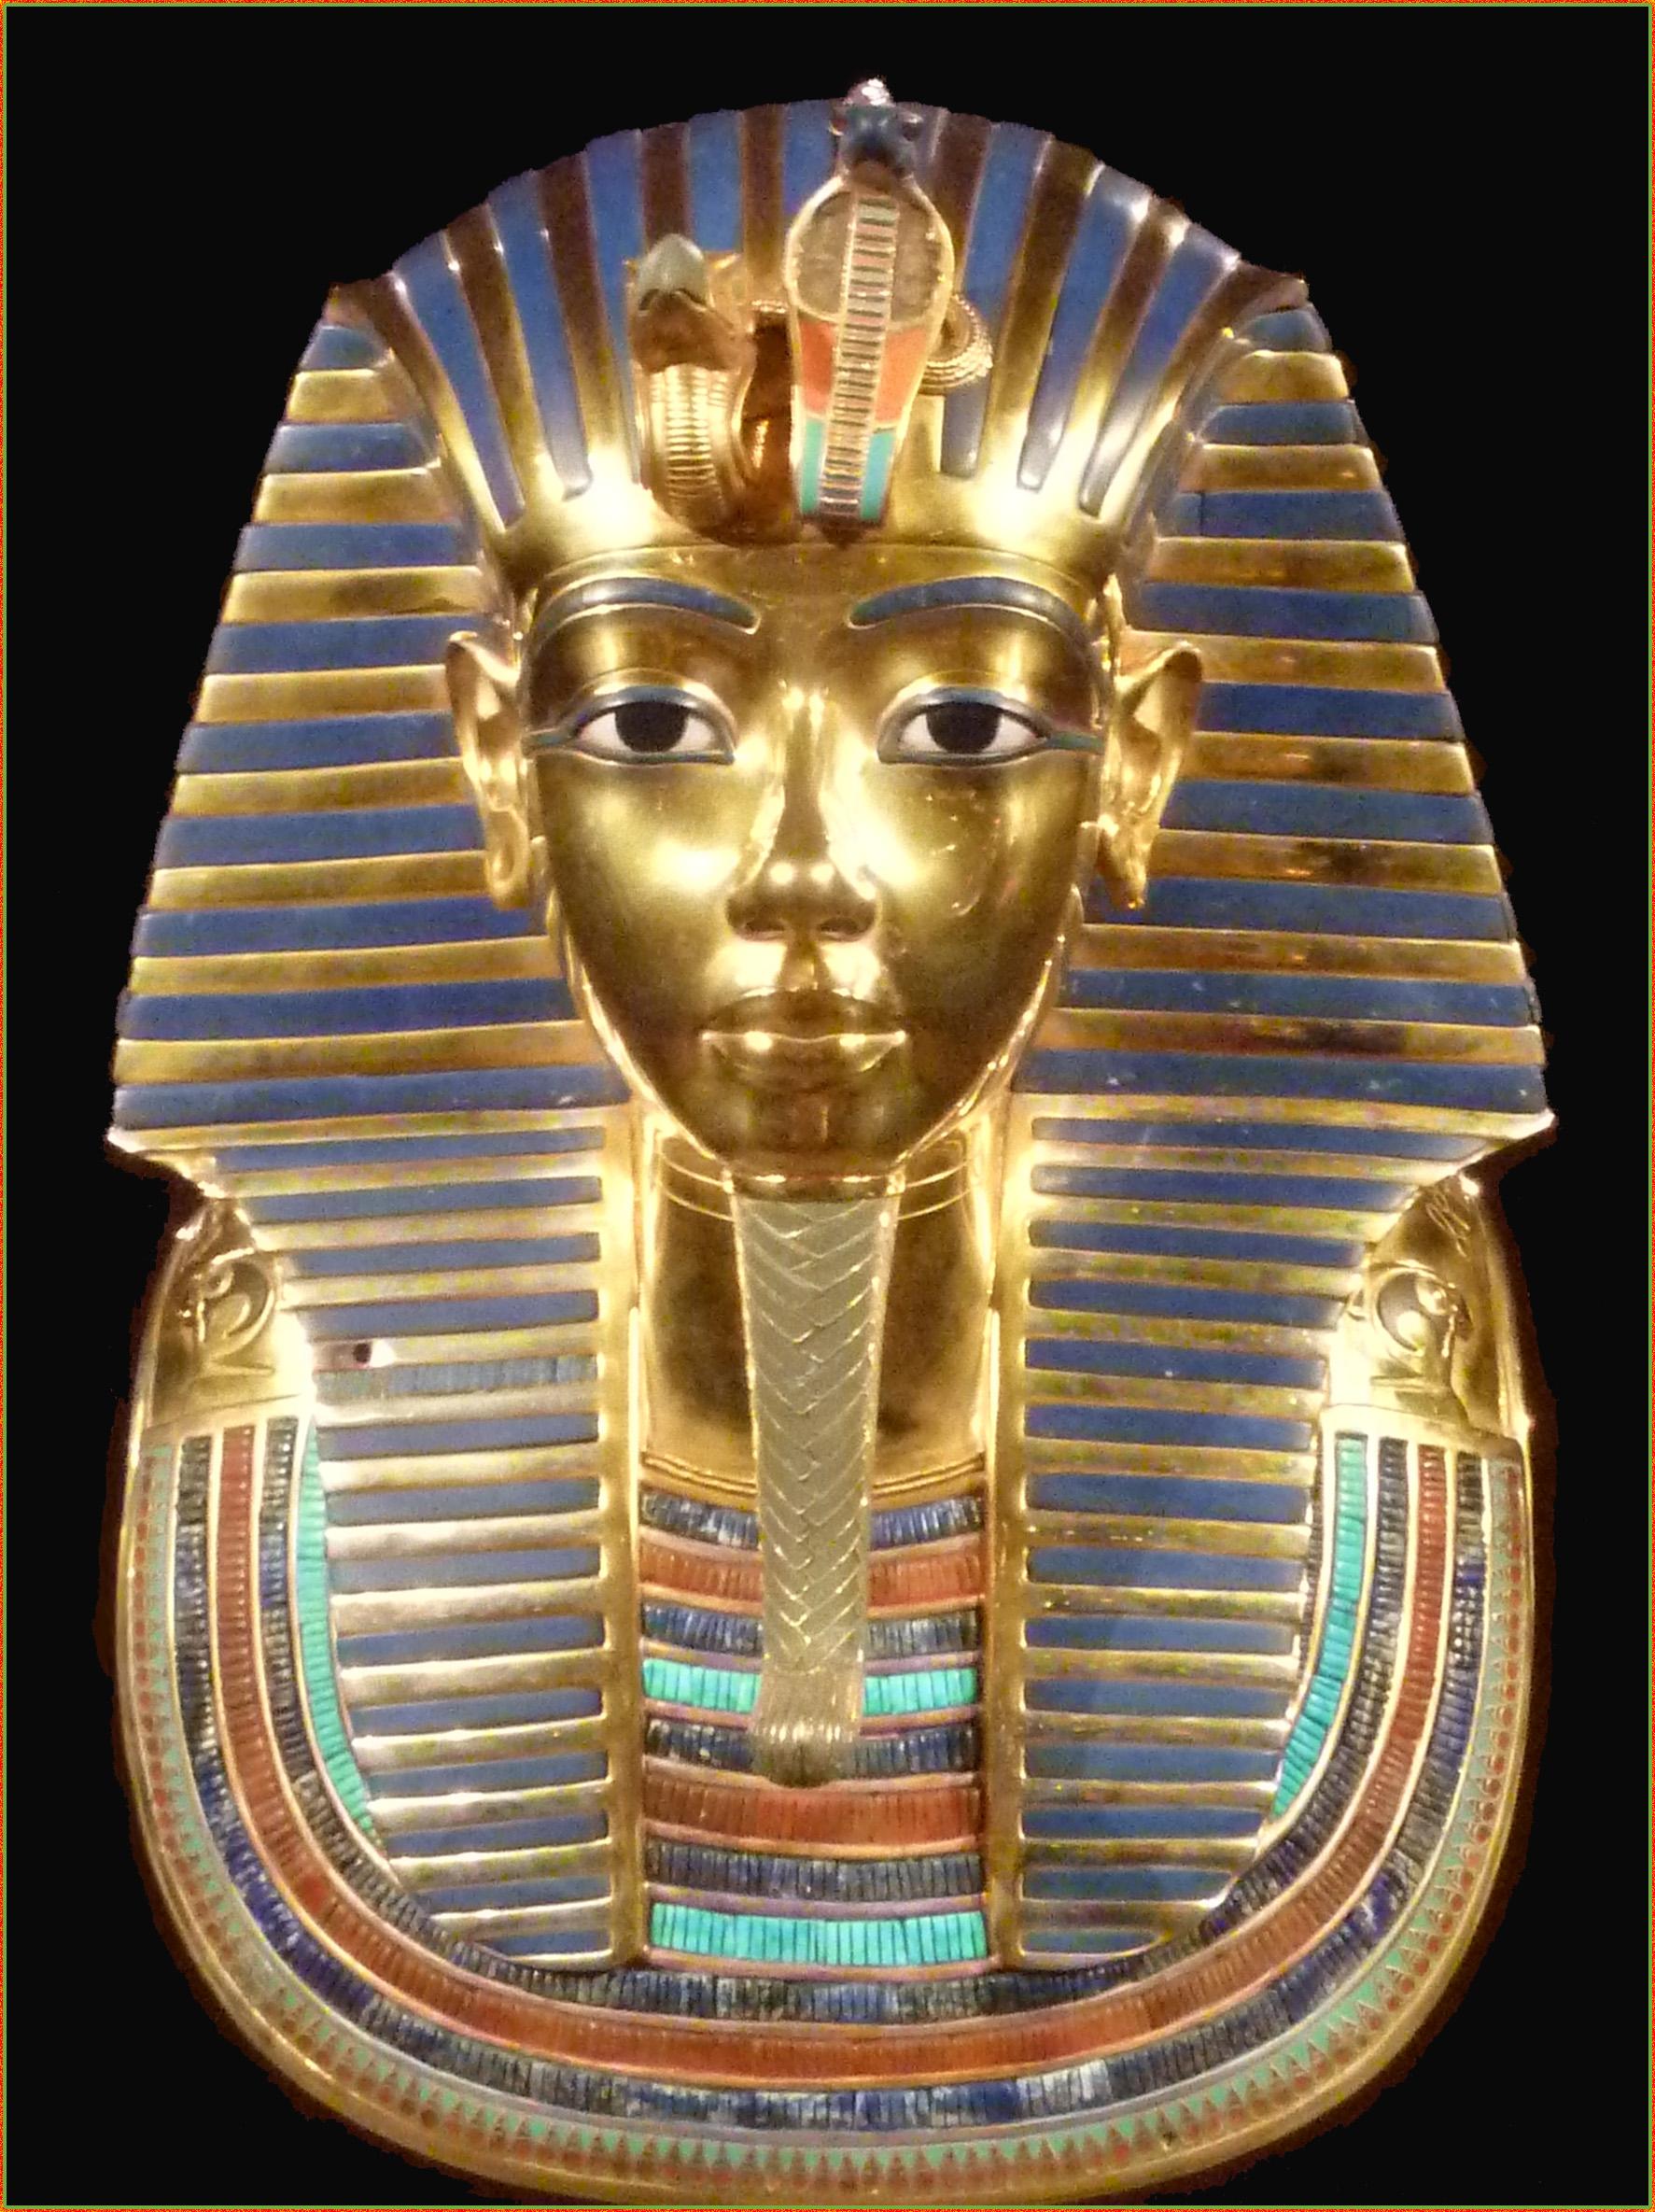 Farao Van Egypte Toetanchamon Bekendste Farao Van Egypte